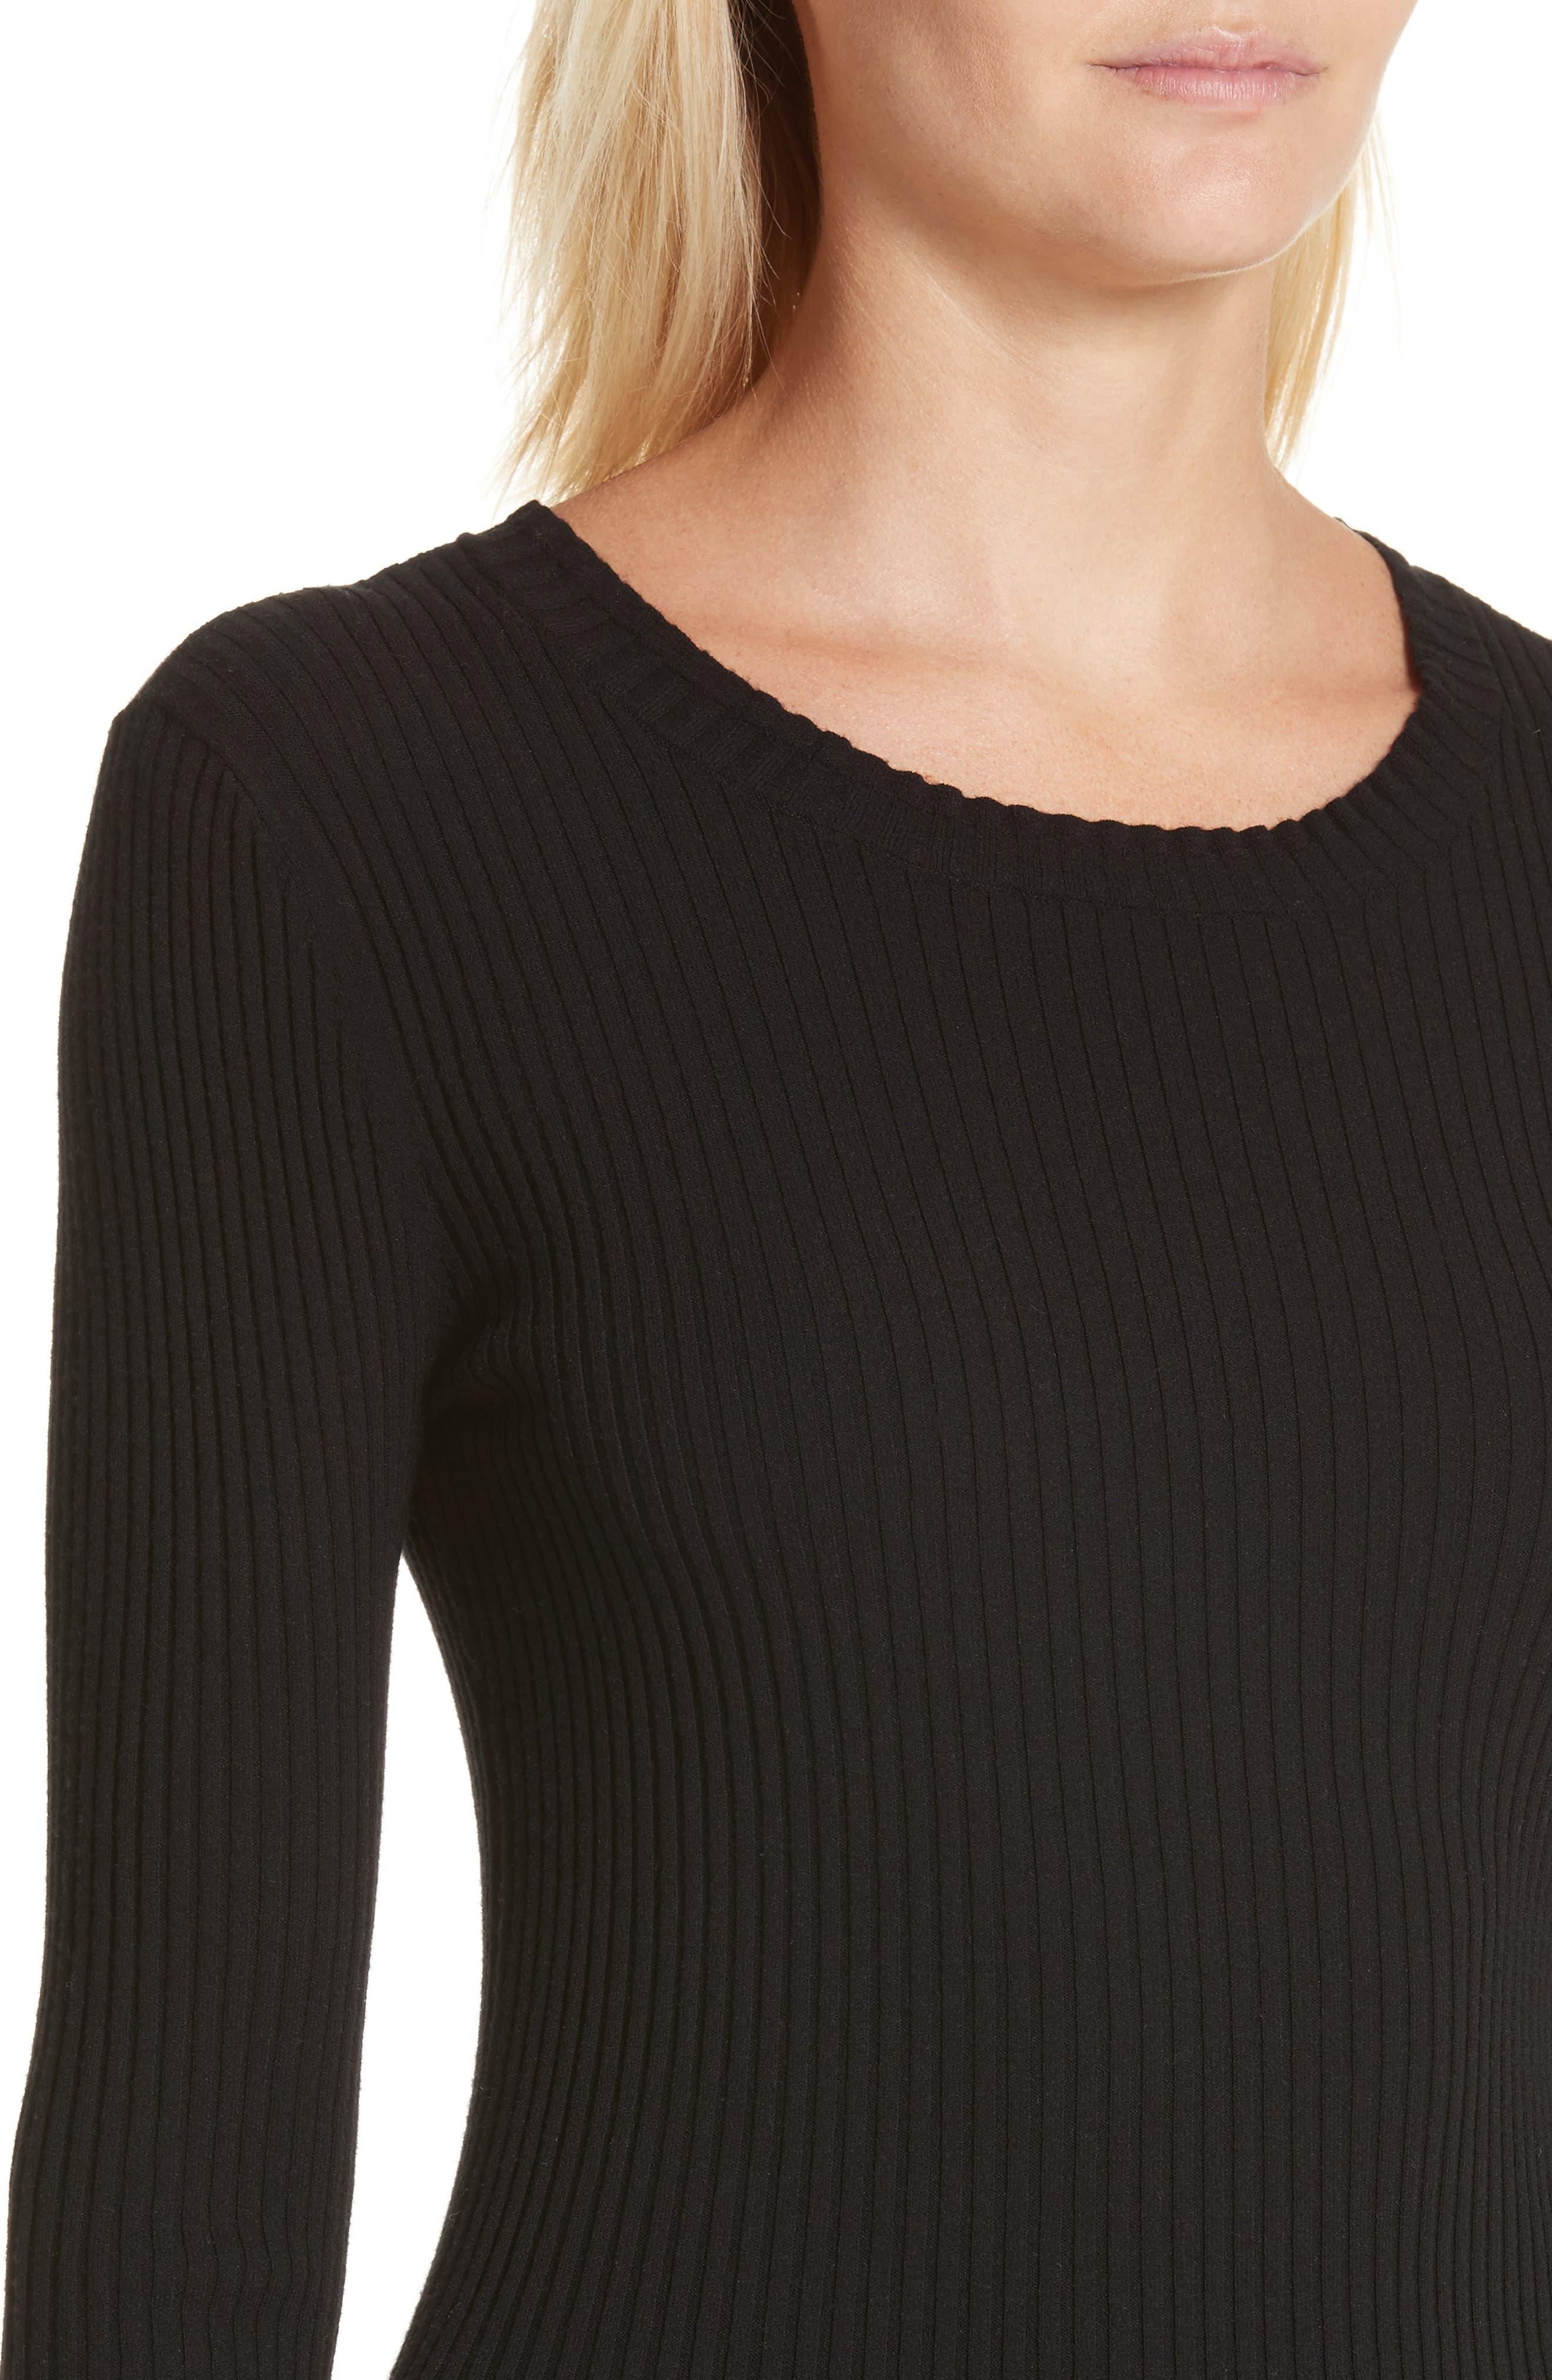 Rib Knit Scoop Neck Sweater,                             Alternate thumbnail 4, color,                             001